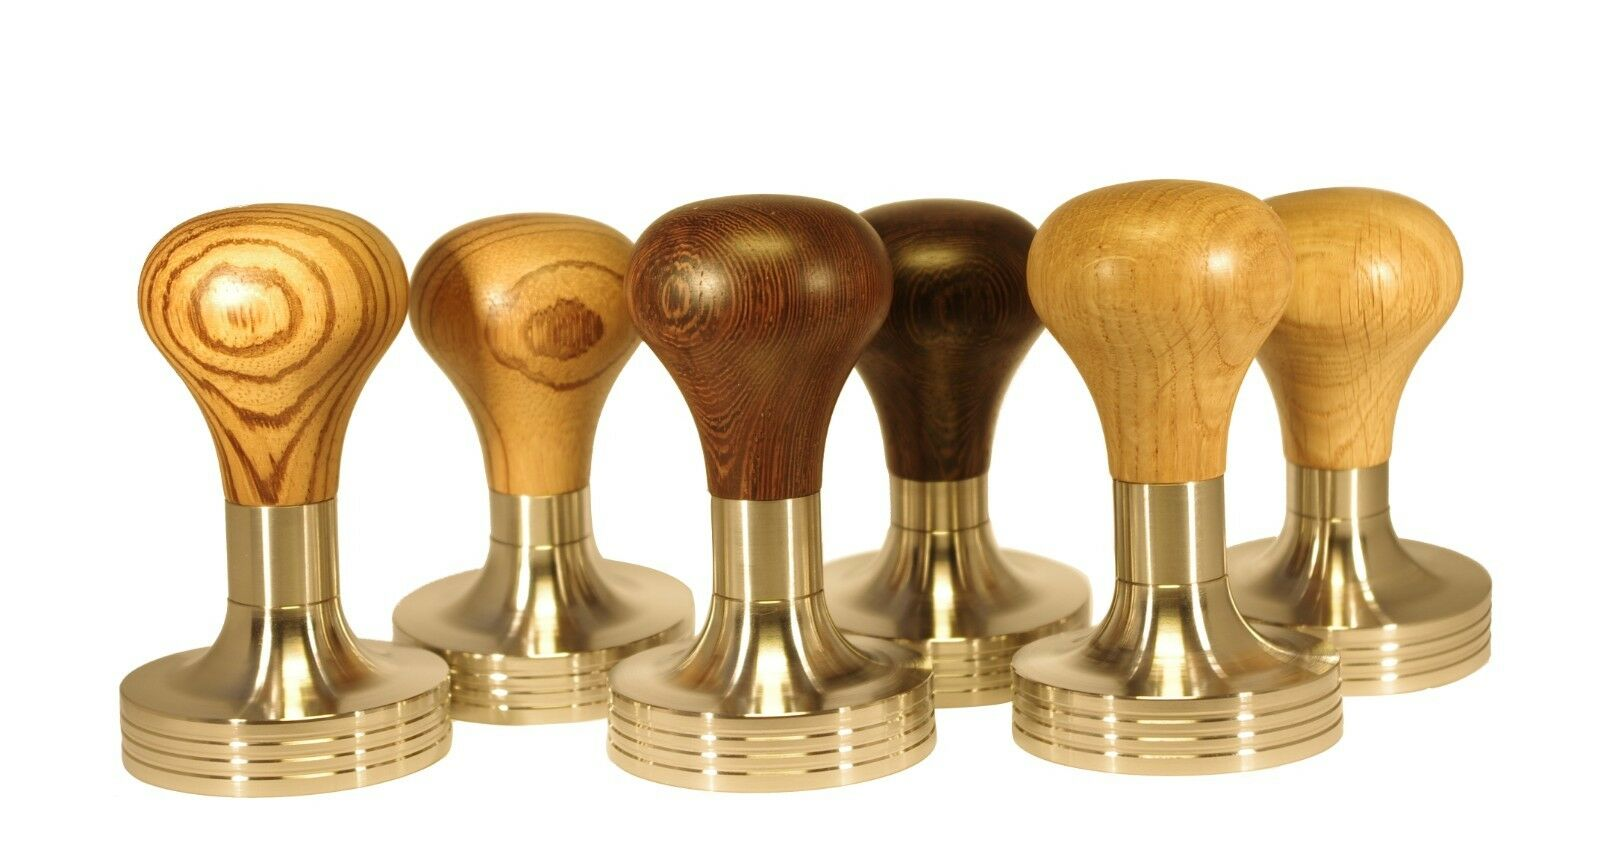 Professionnel King Espresso Tamper 58.6 mm ou 58.4 mm